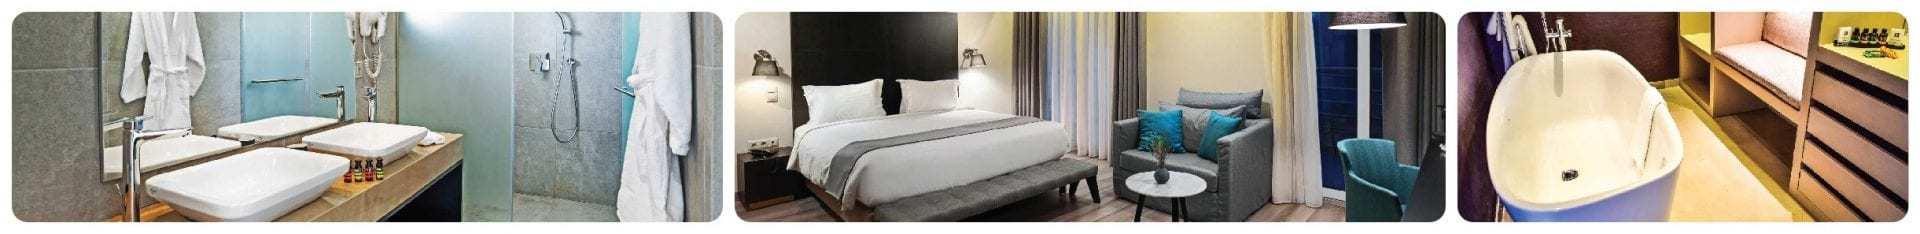 Hotel Lozenge - תמונות חדרים מתוך האתר הרשמי